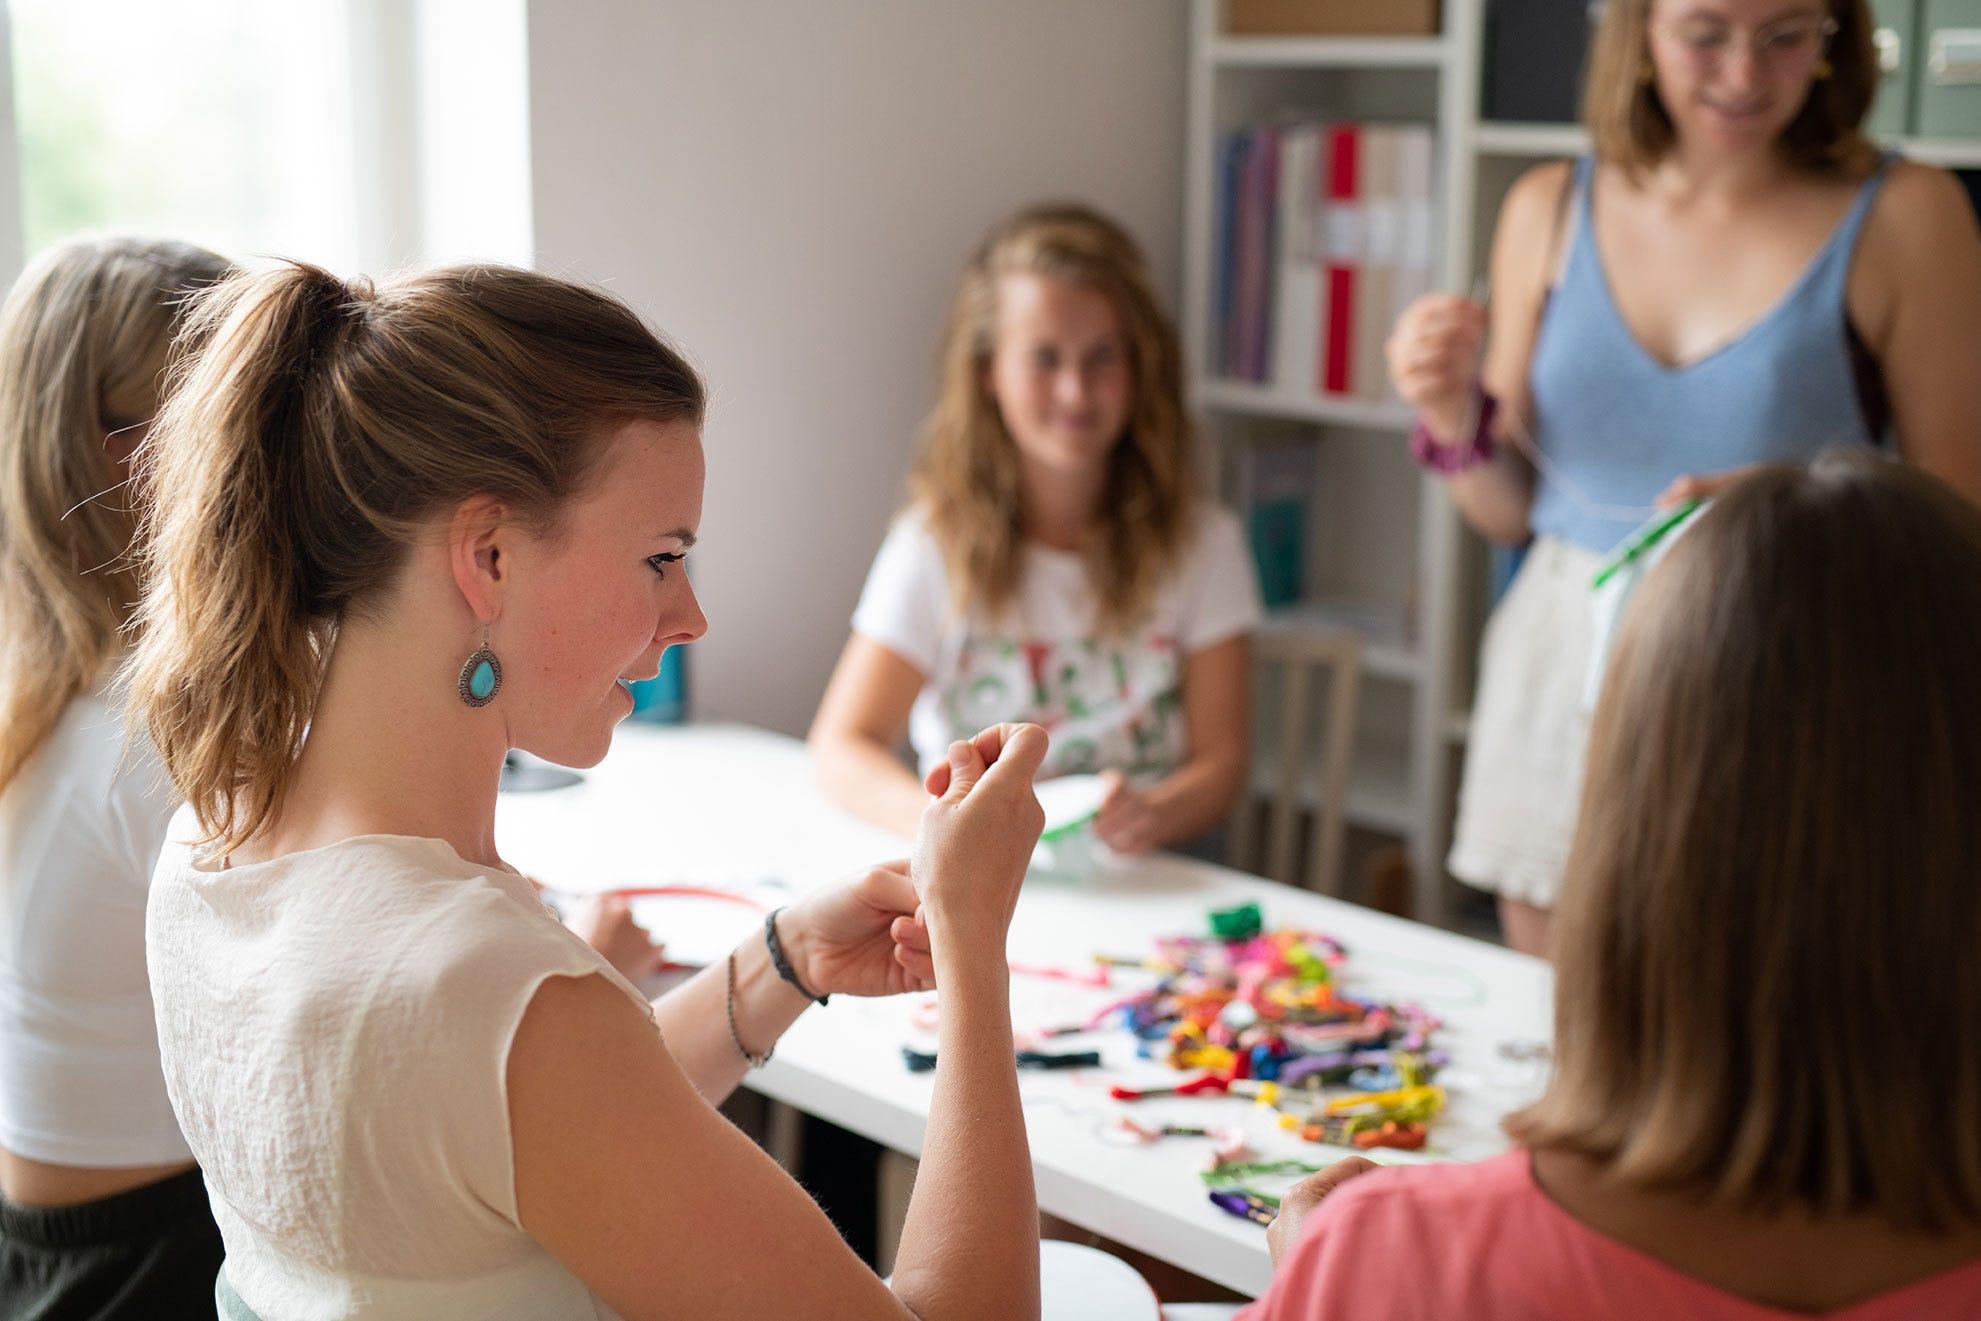 Ladies enjoying craft class